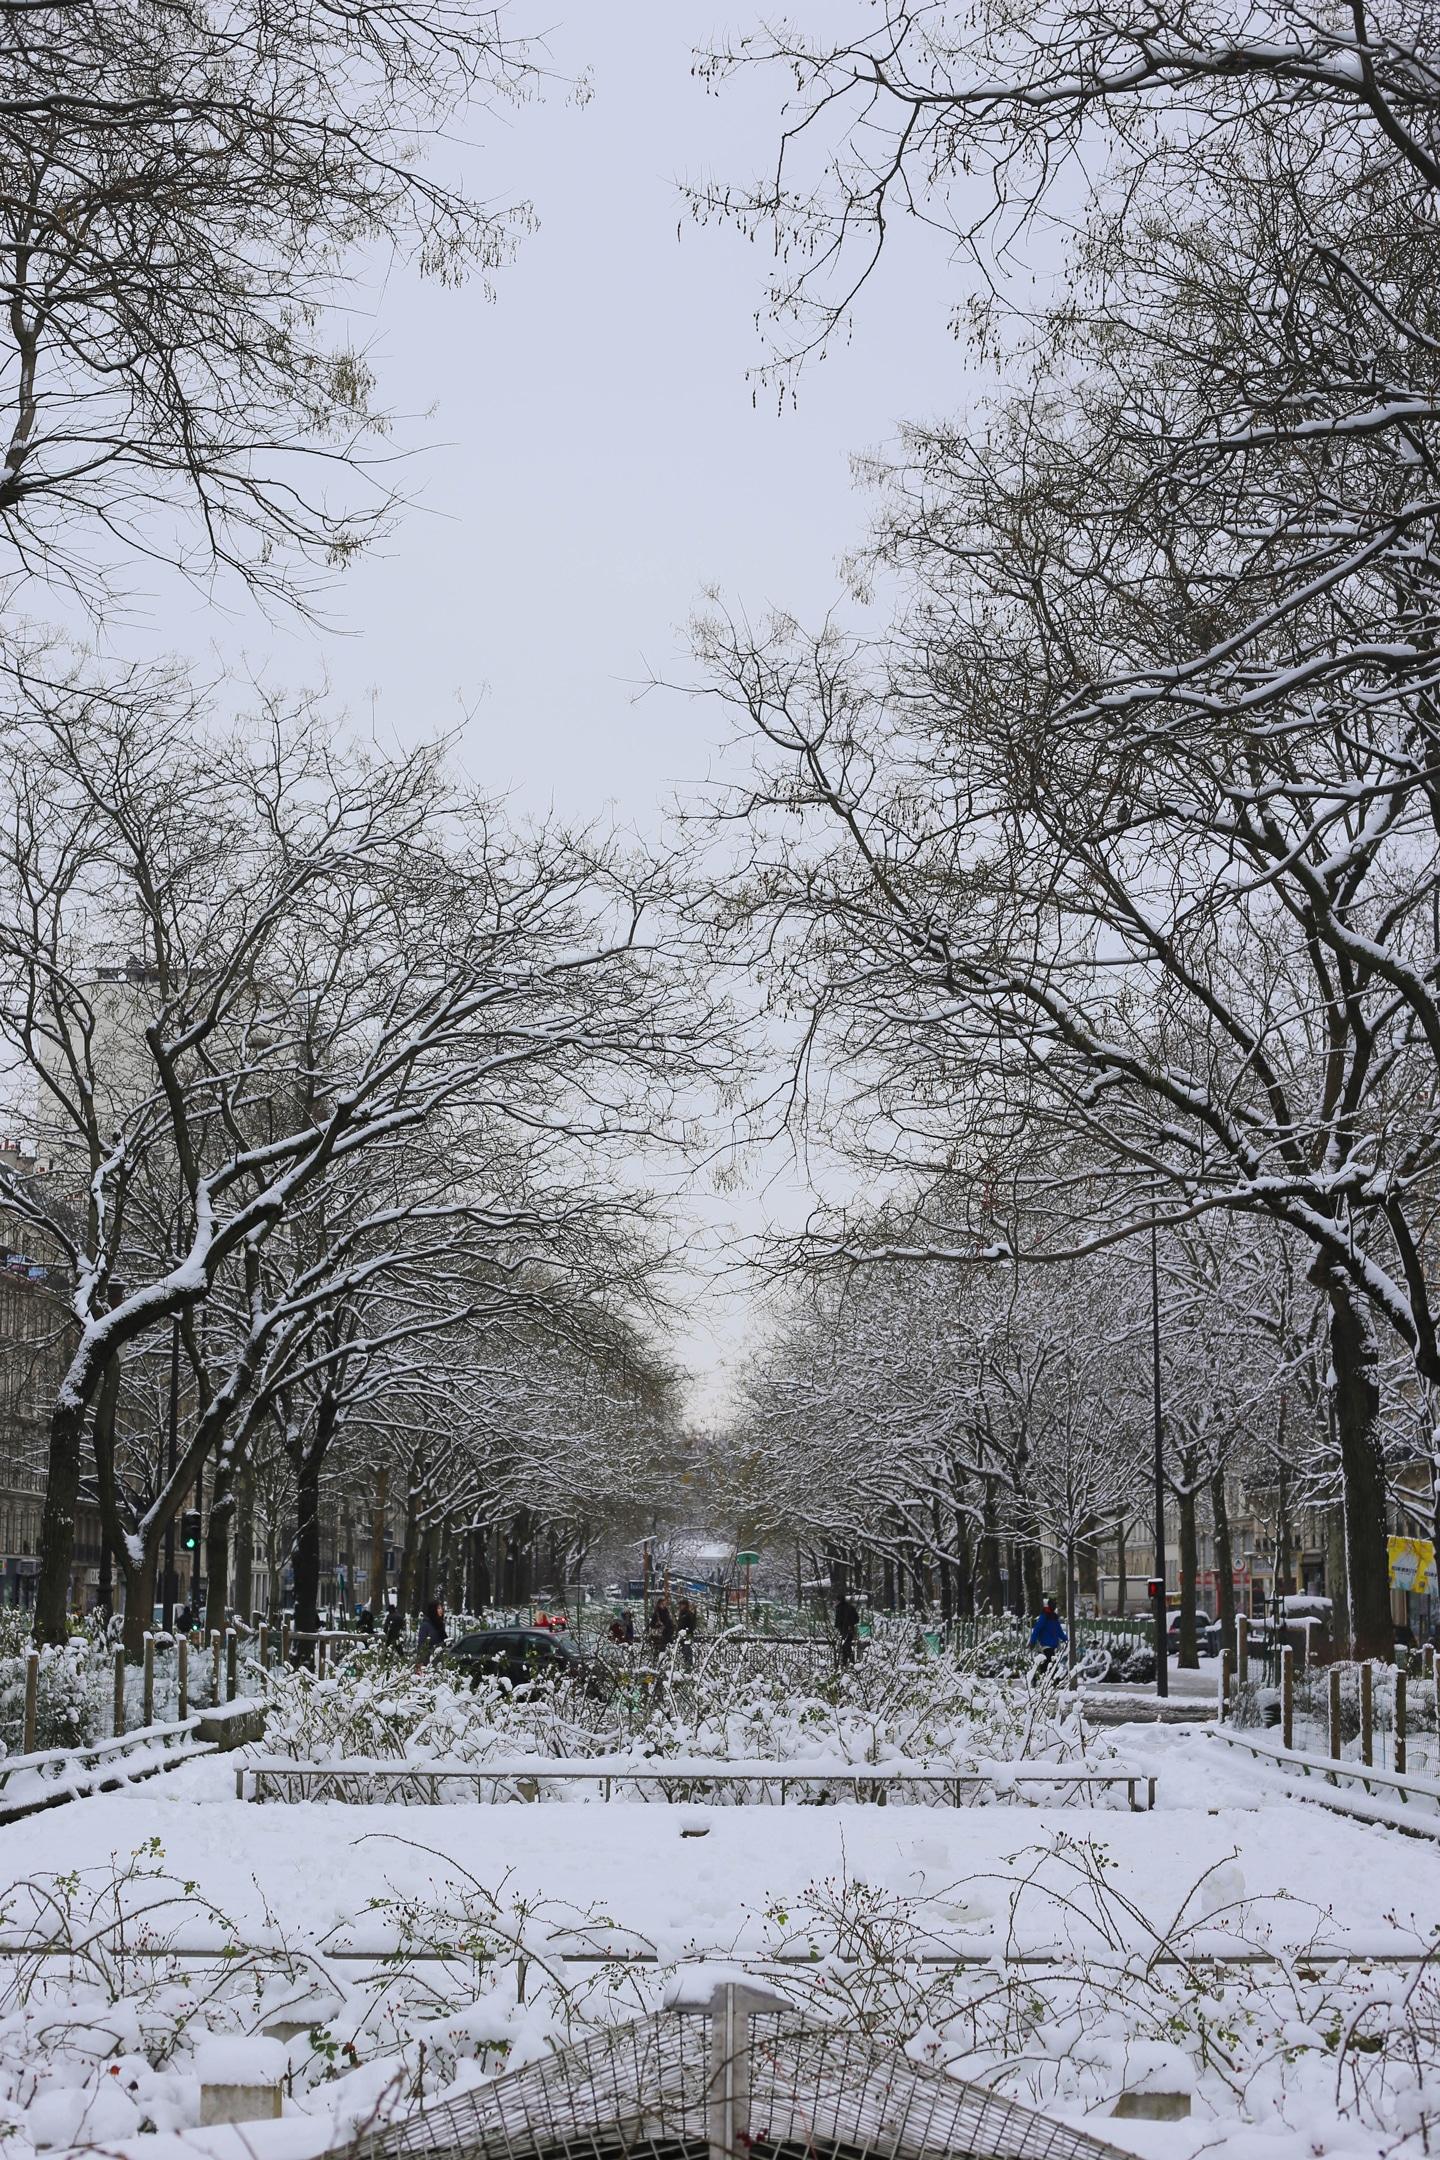 20180228_WinterWonderland_11.jpg